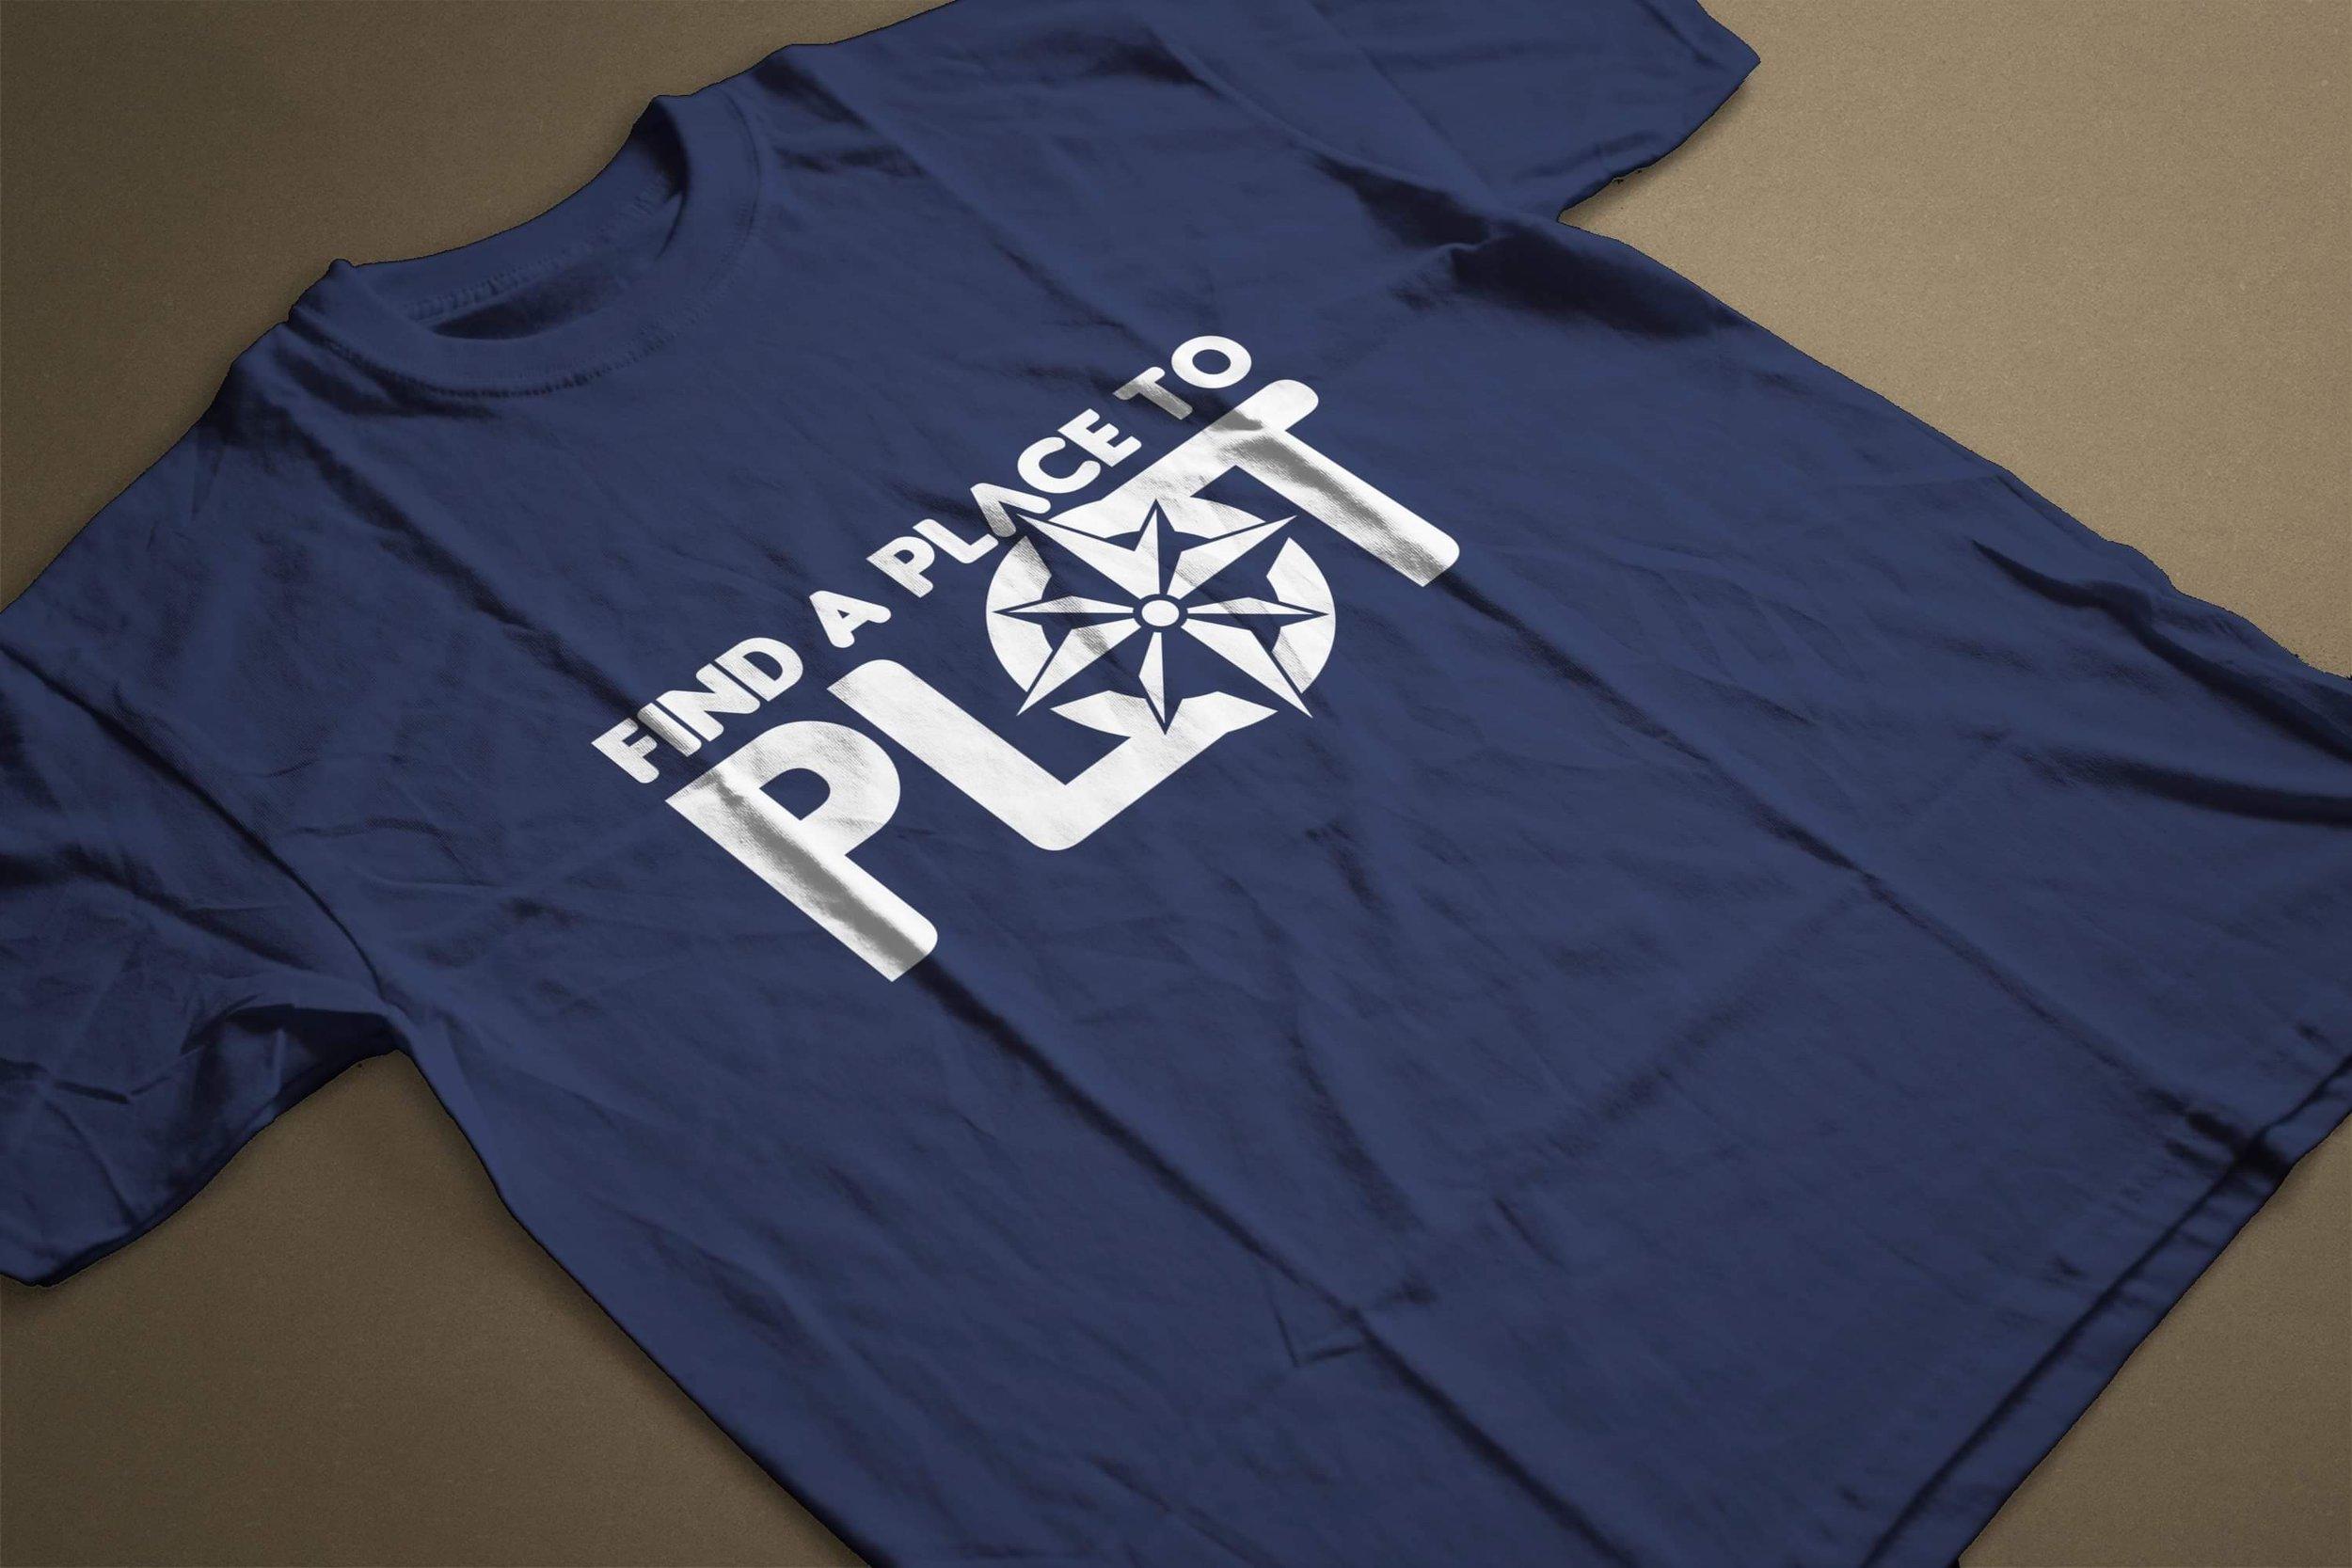 place plot shirt blue.JPG